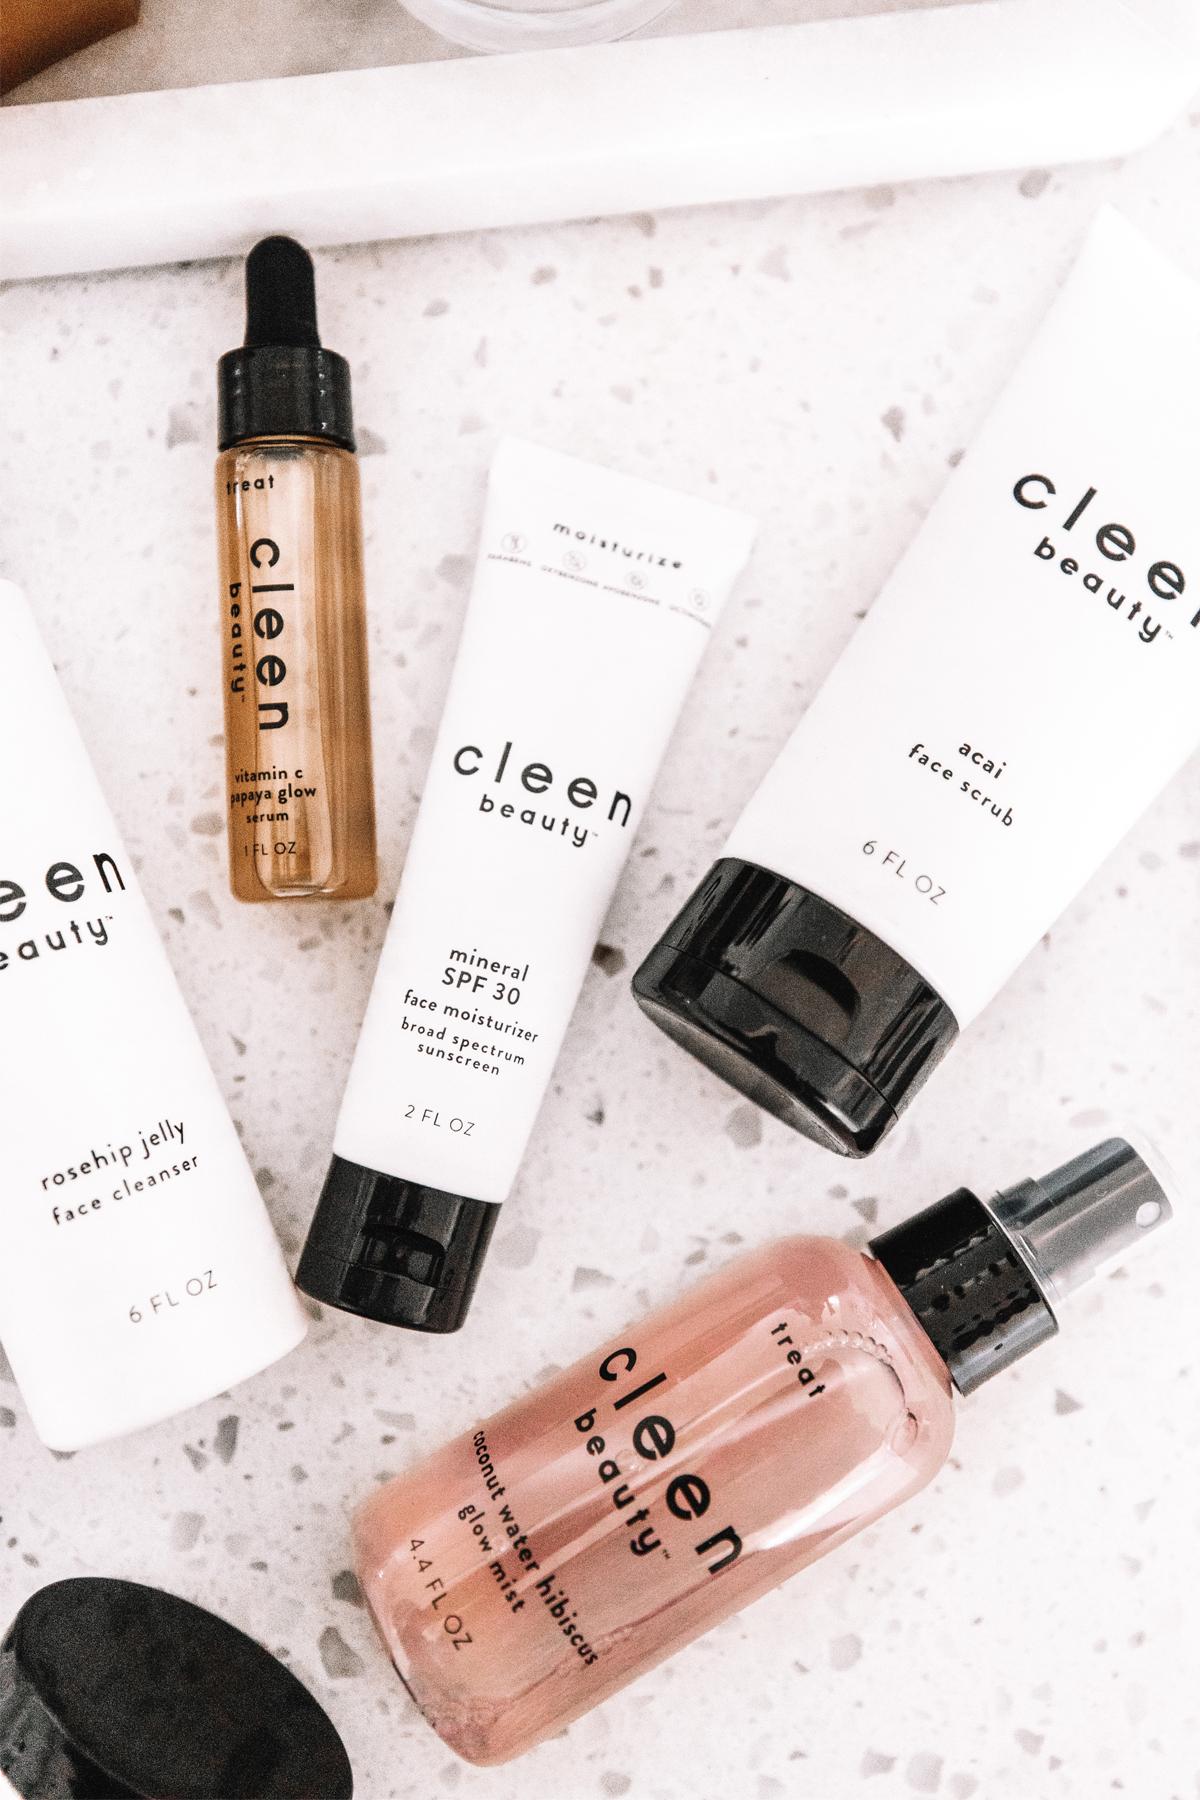 Fashion Jackson Walmart Beauty Cleen Beauty Products